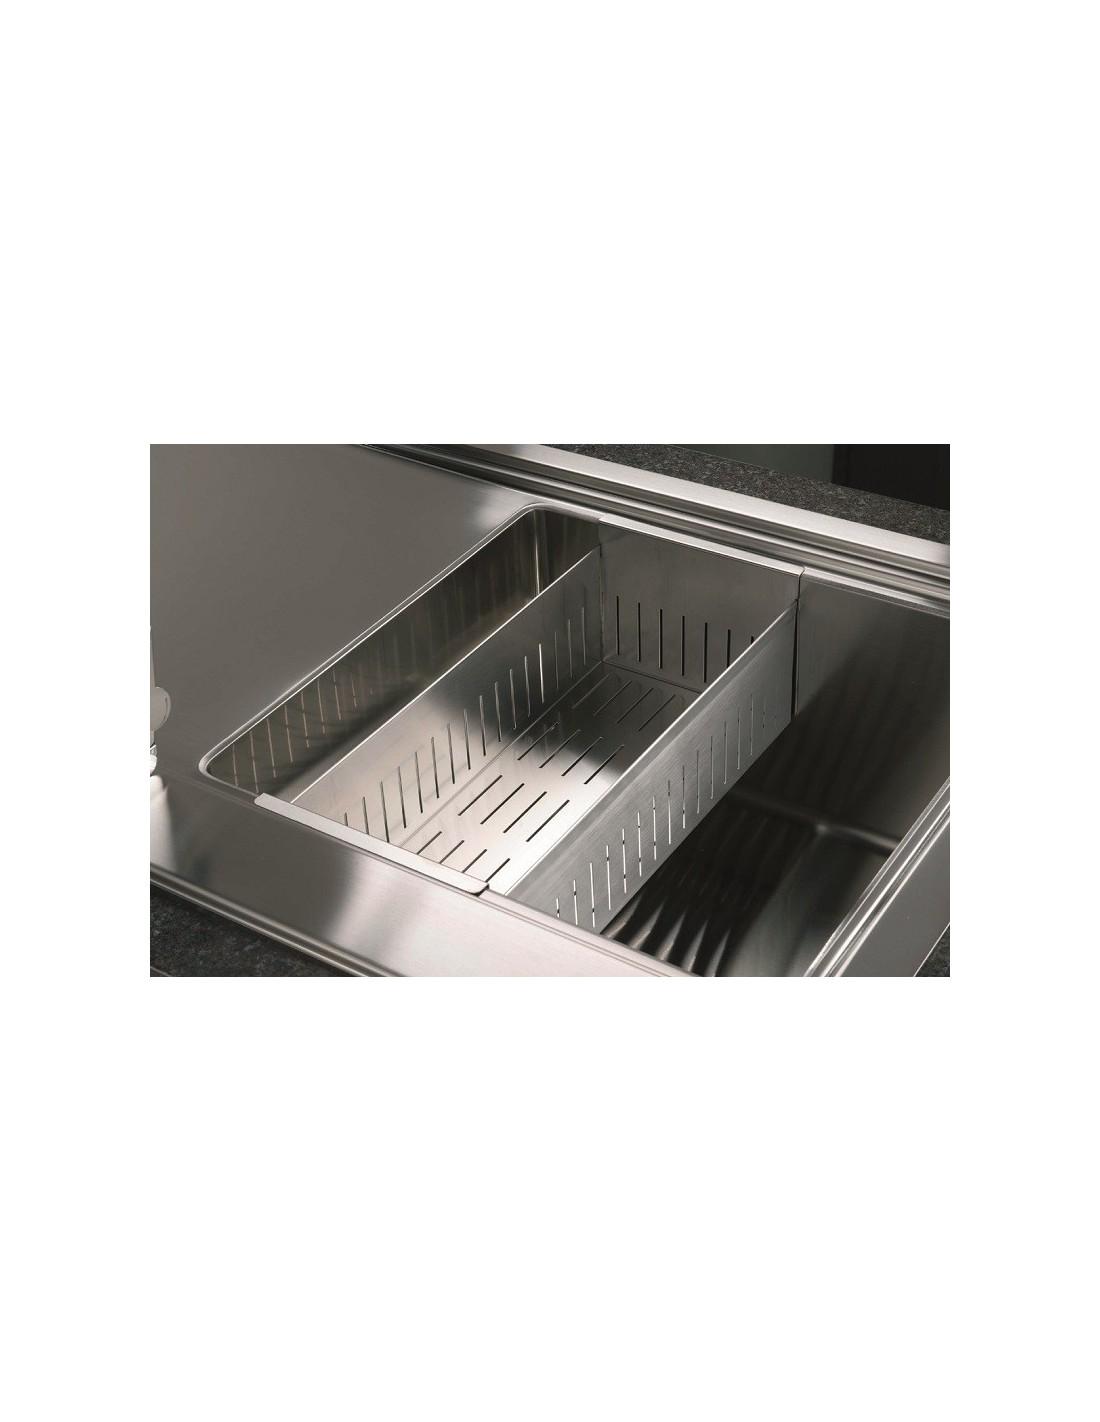 VSH20Q Stainless Steel Modern Square Sink Colander Strainer 20Cm